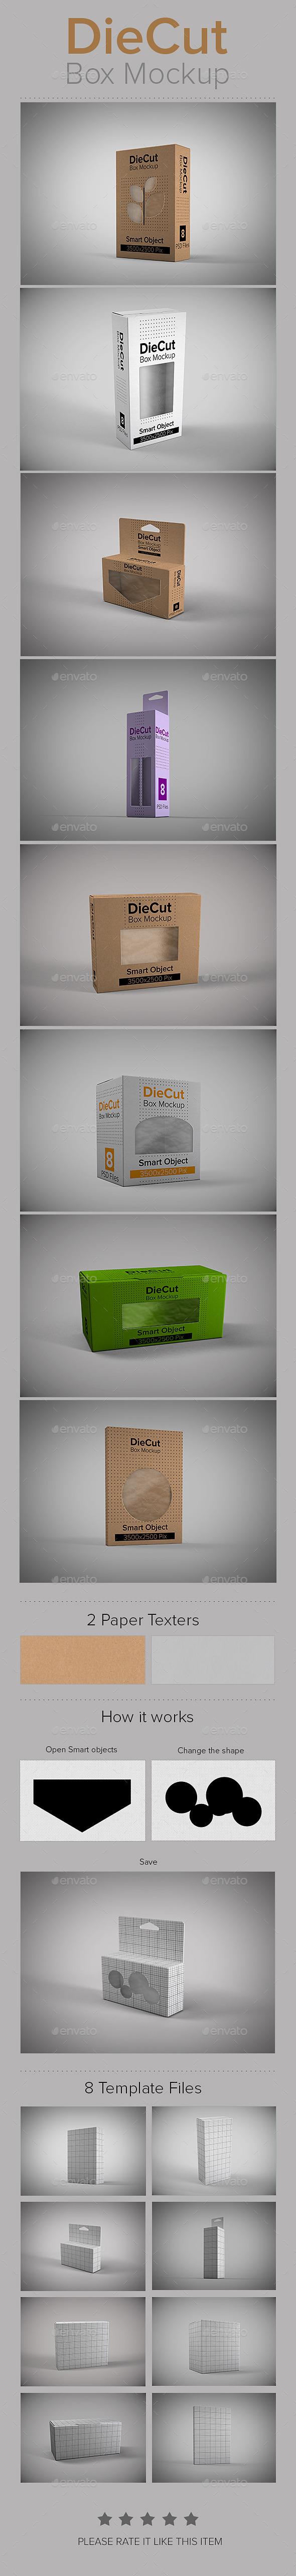 DieCut Box Mockup - Miscellaneous Packaging